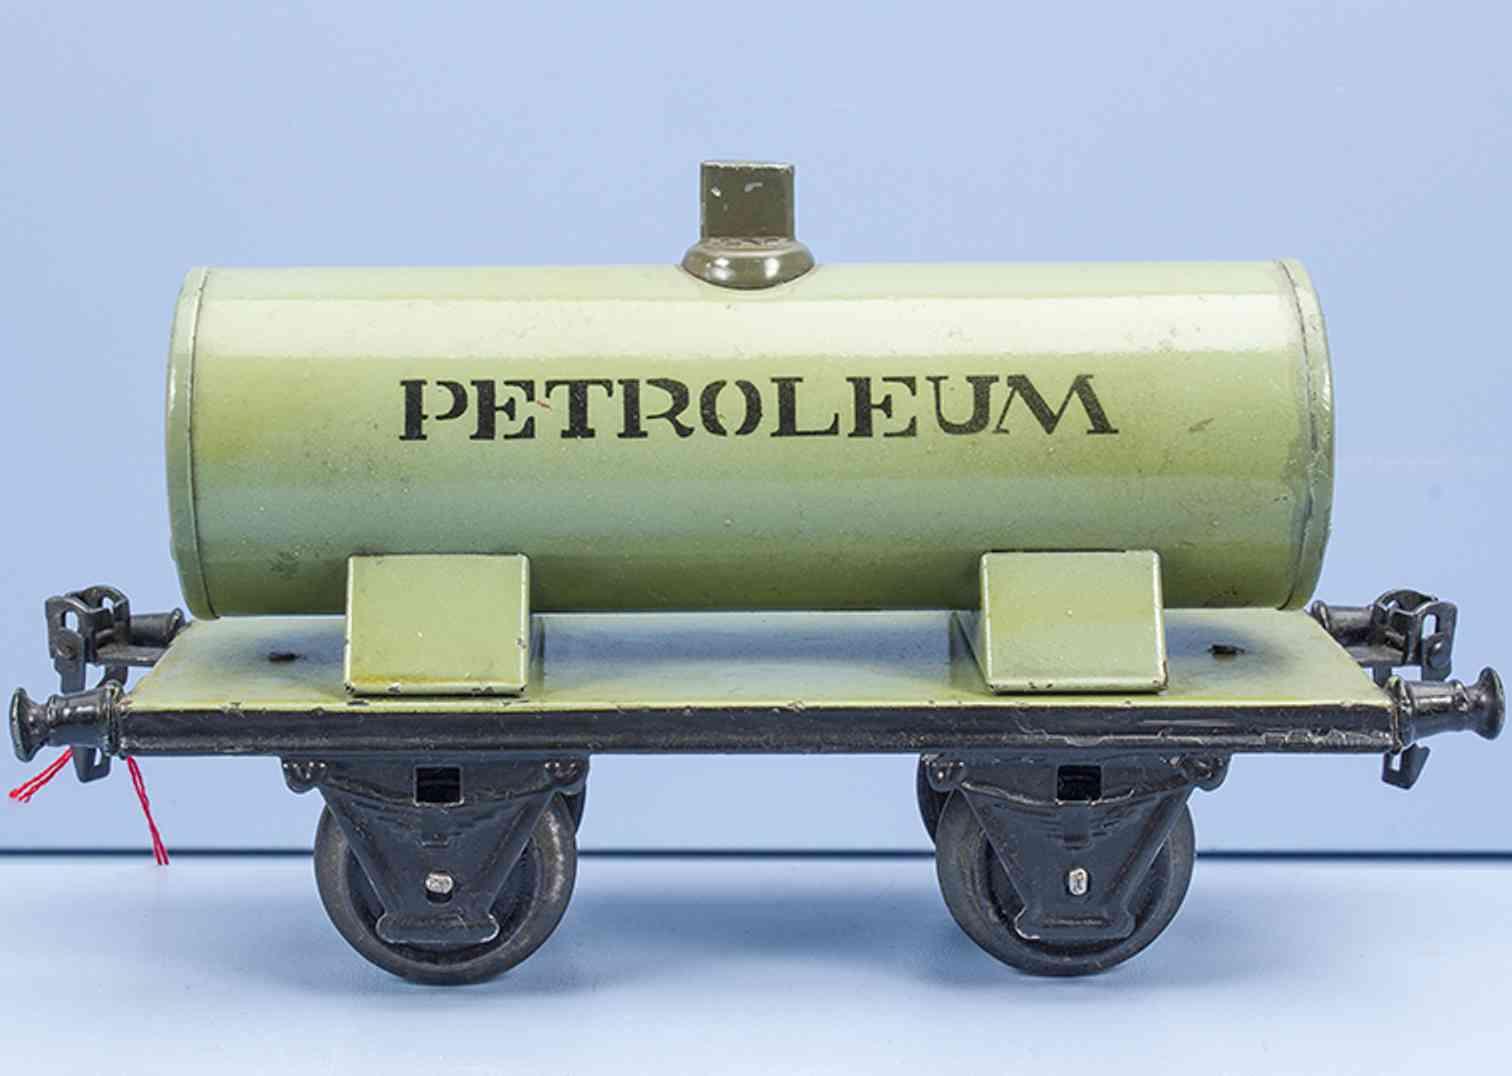 marklin maerklin 1973/1 petroleum railway toy tank car gauge 1